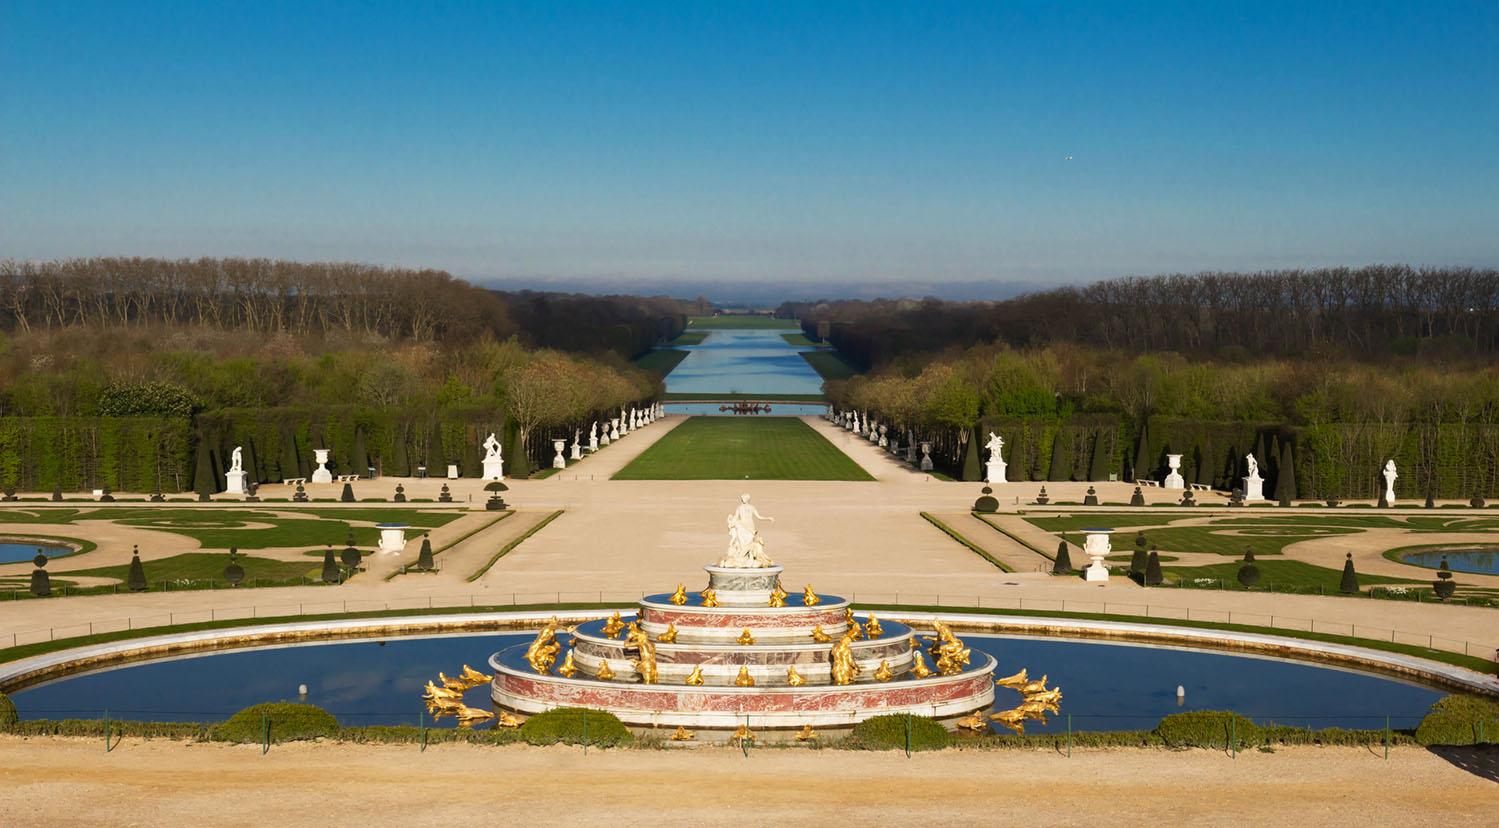 The Latona Fountain in the Garden of Versailles in France. The Garden of Versailles is on the UNESCO World Heritage List.